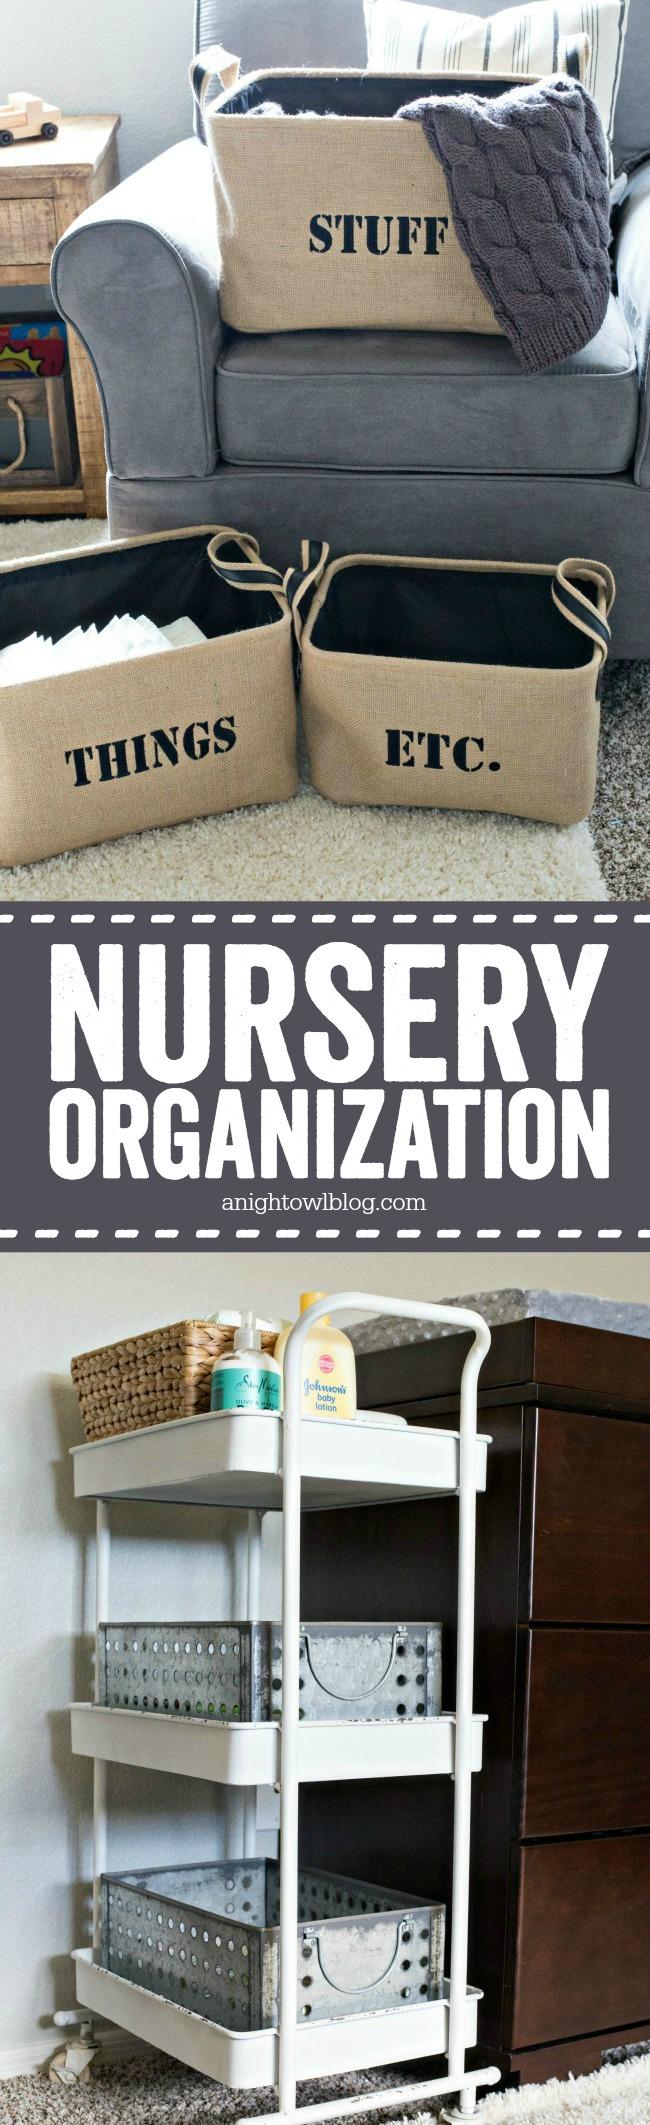 So many easy nursery organization ideas - perfect for an urban industrial themed nursery!